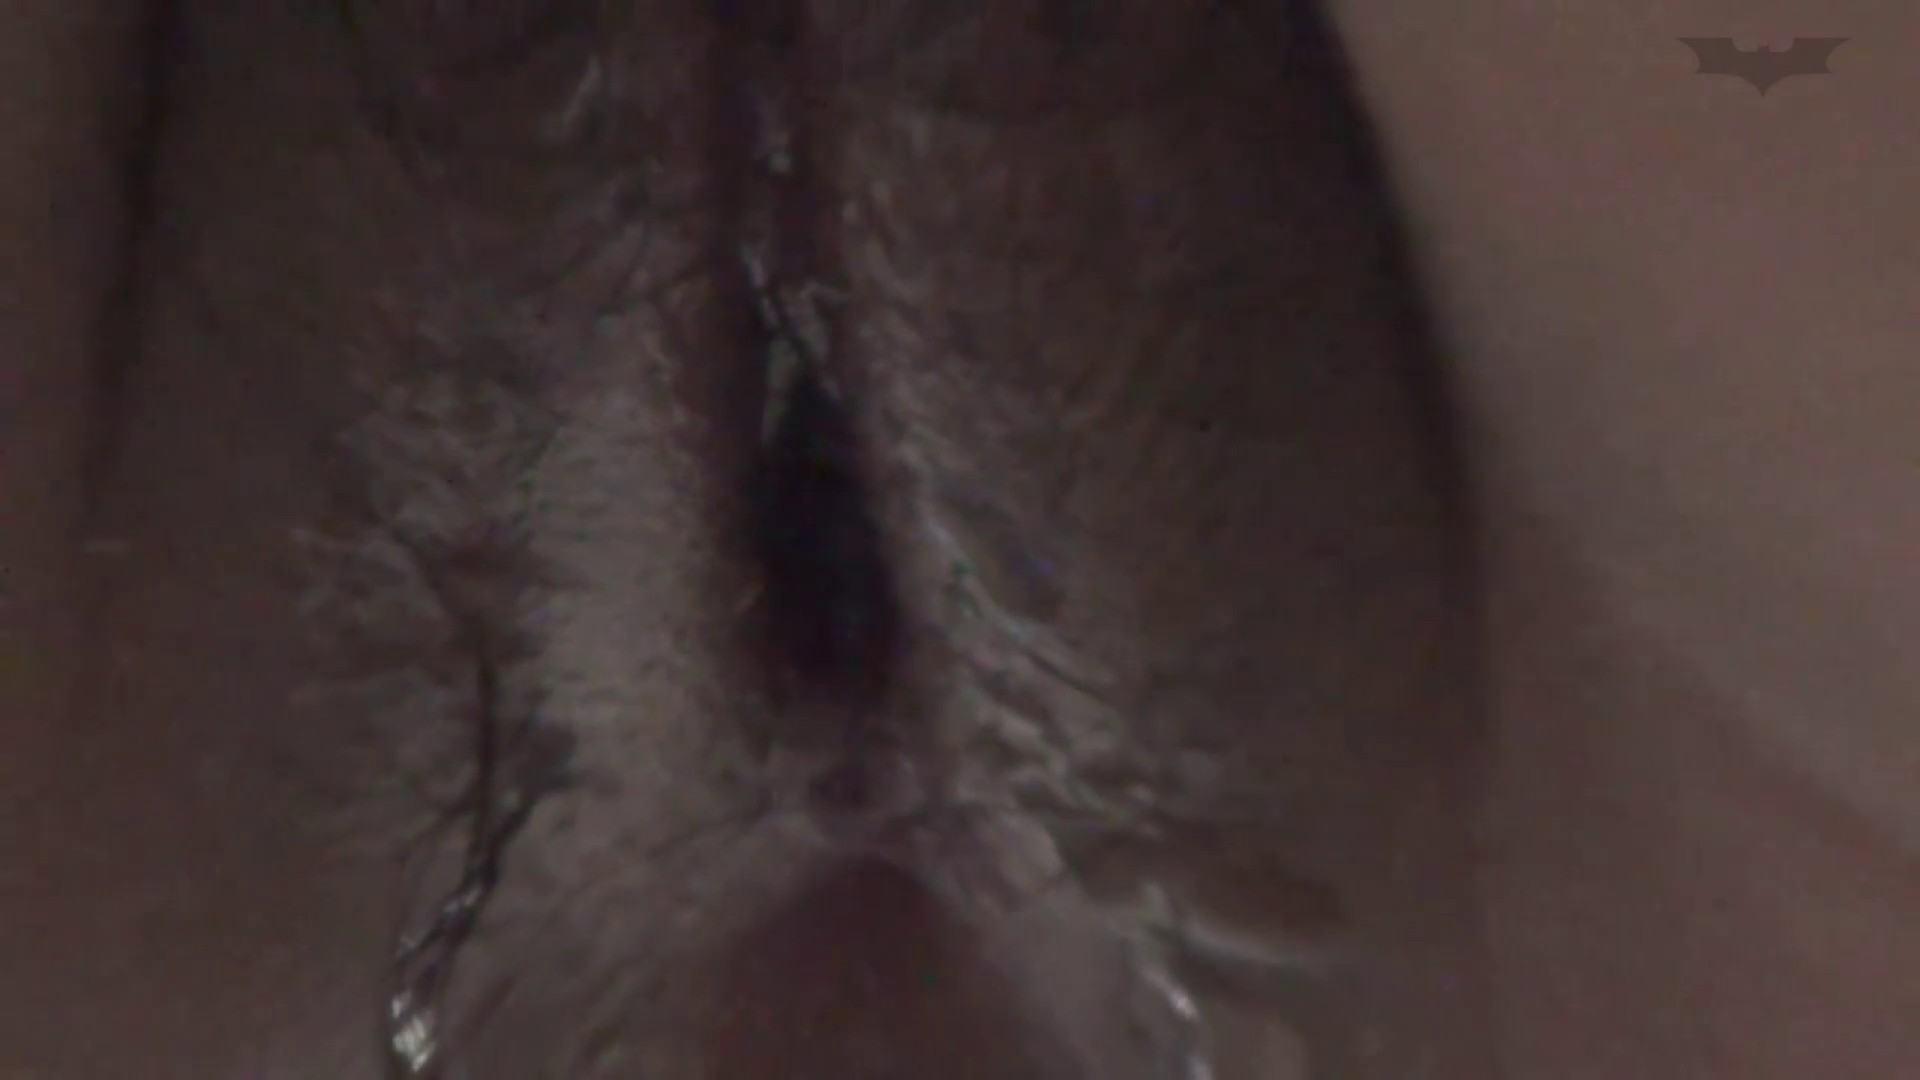 JD盗撮 美女の洗面所の秘密 Vol.44 OLの実態 盗み撮り動画キャプチャ 98pic 47